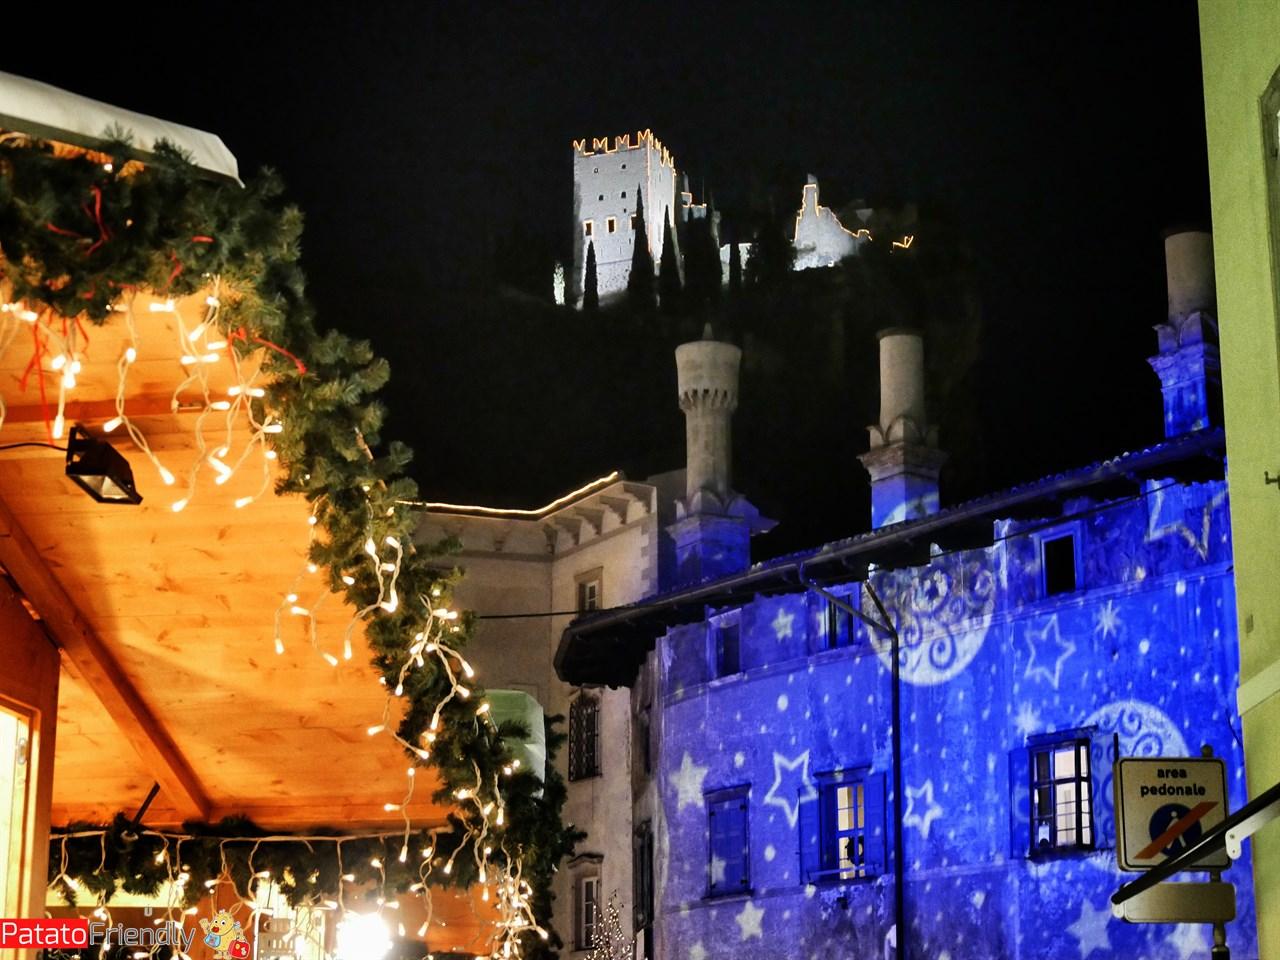 [cml_media_alt id='13030']Una vacanza nel Garda Trentino a Natale: Arco[/cml_media_alt]